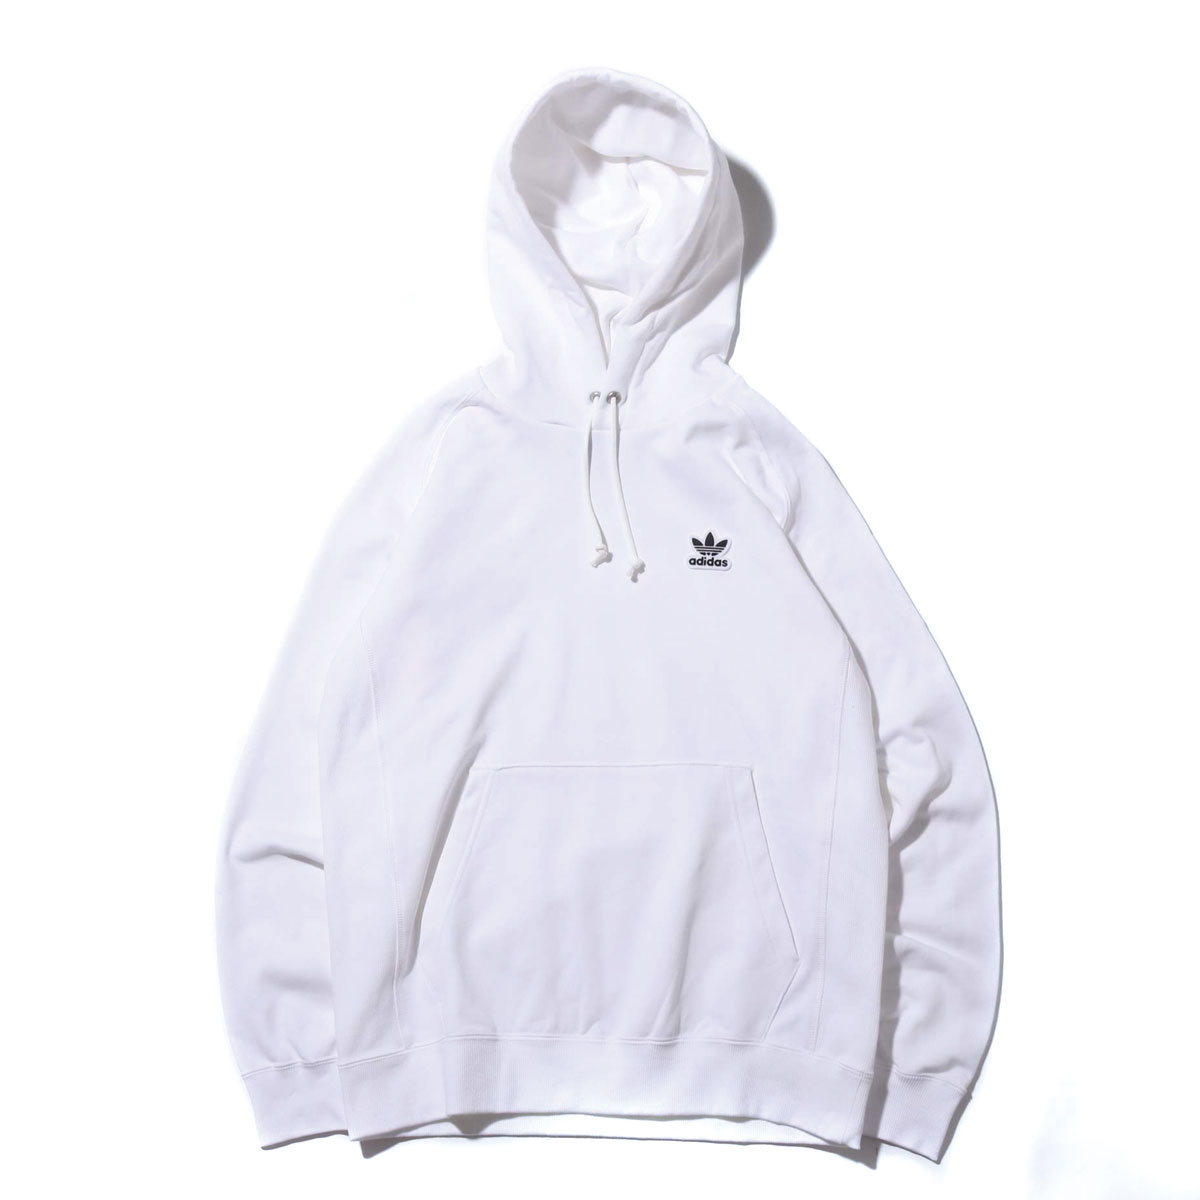 adidas Originals AC WAPPEN HOODIE(WHITE)(アディダスオリジナルス AC ワッペン フーディー)【メンズ】【パーカー】【19SS-I】